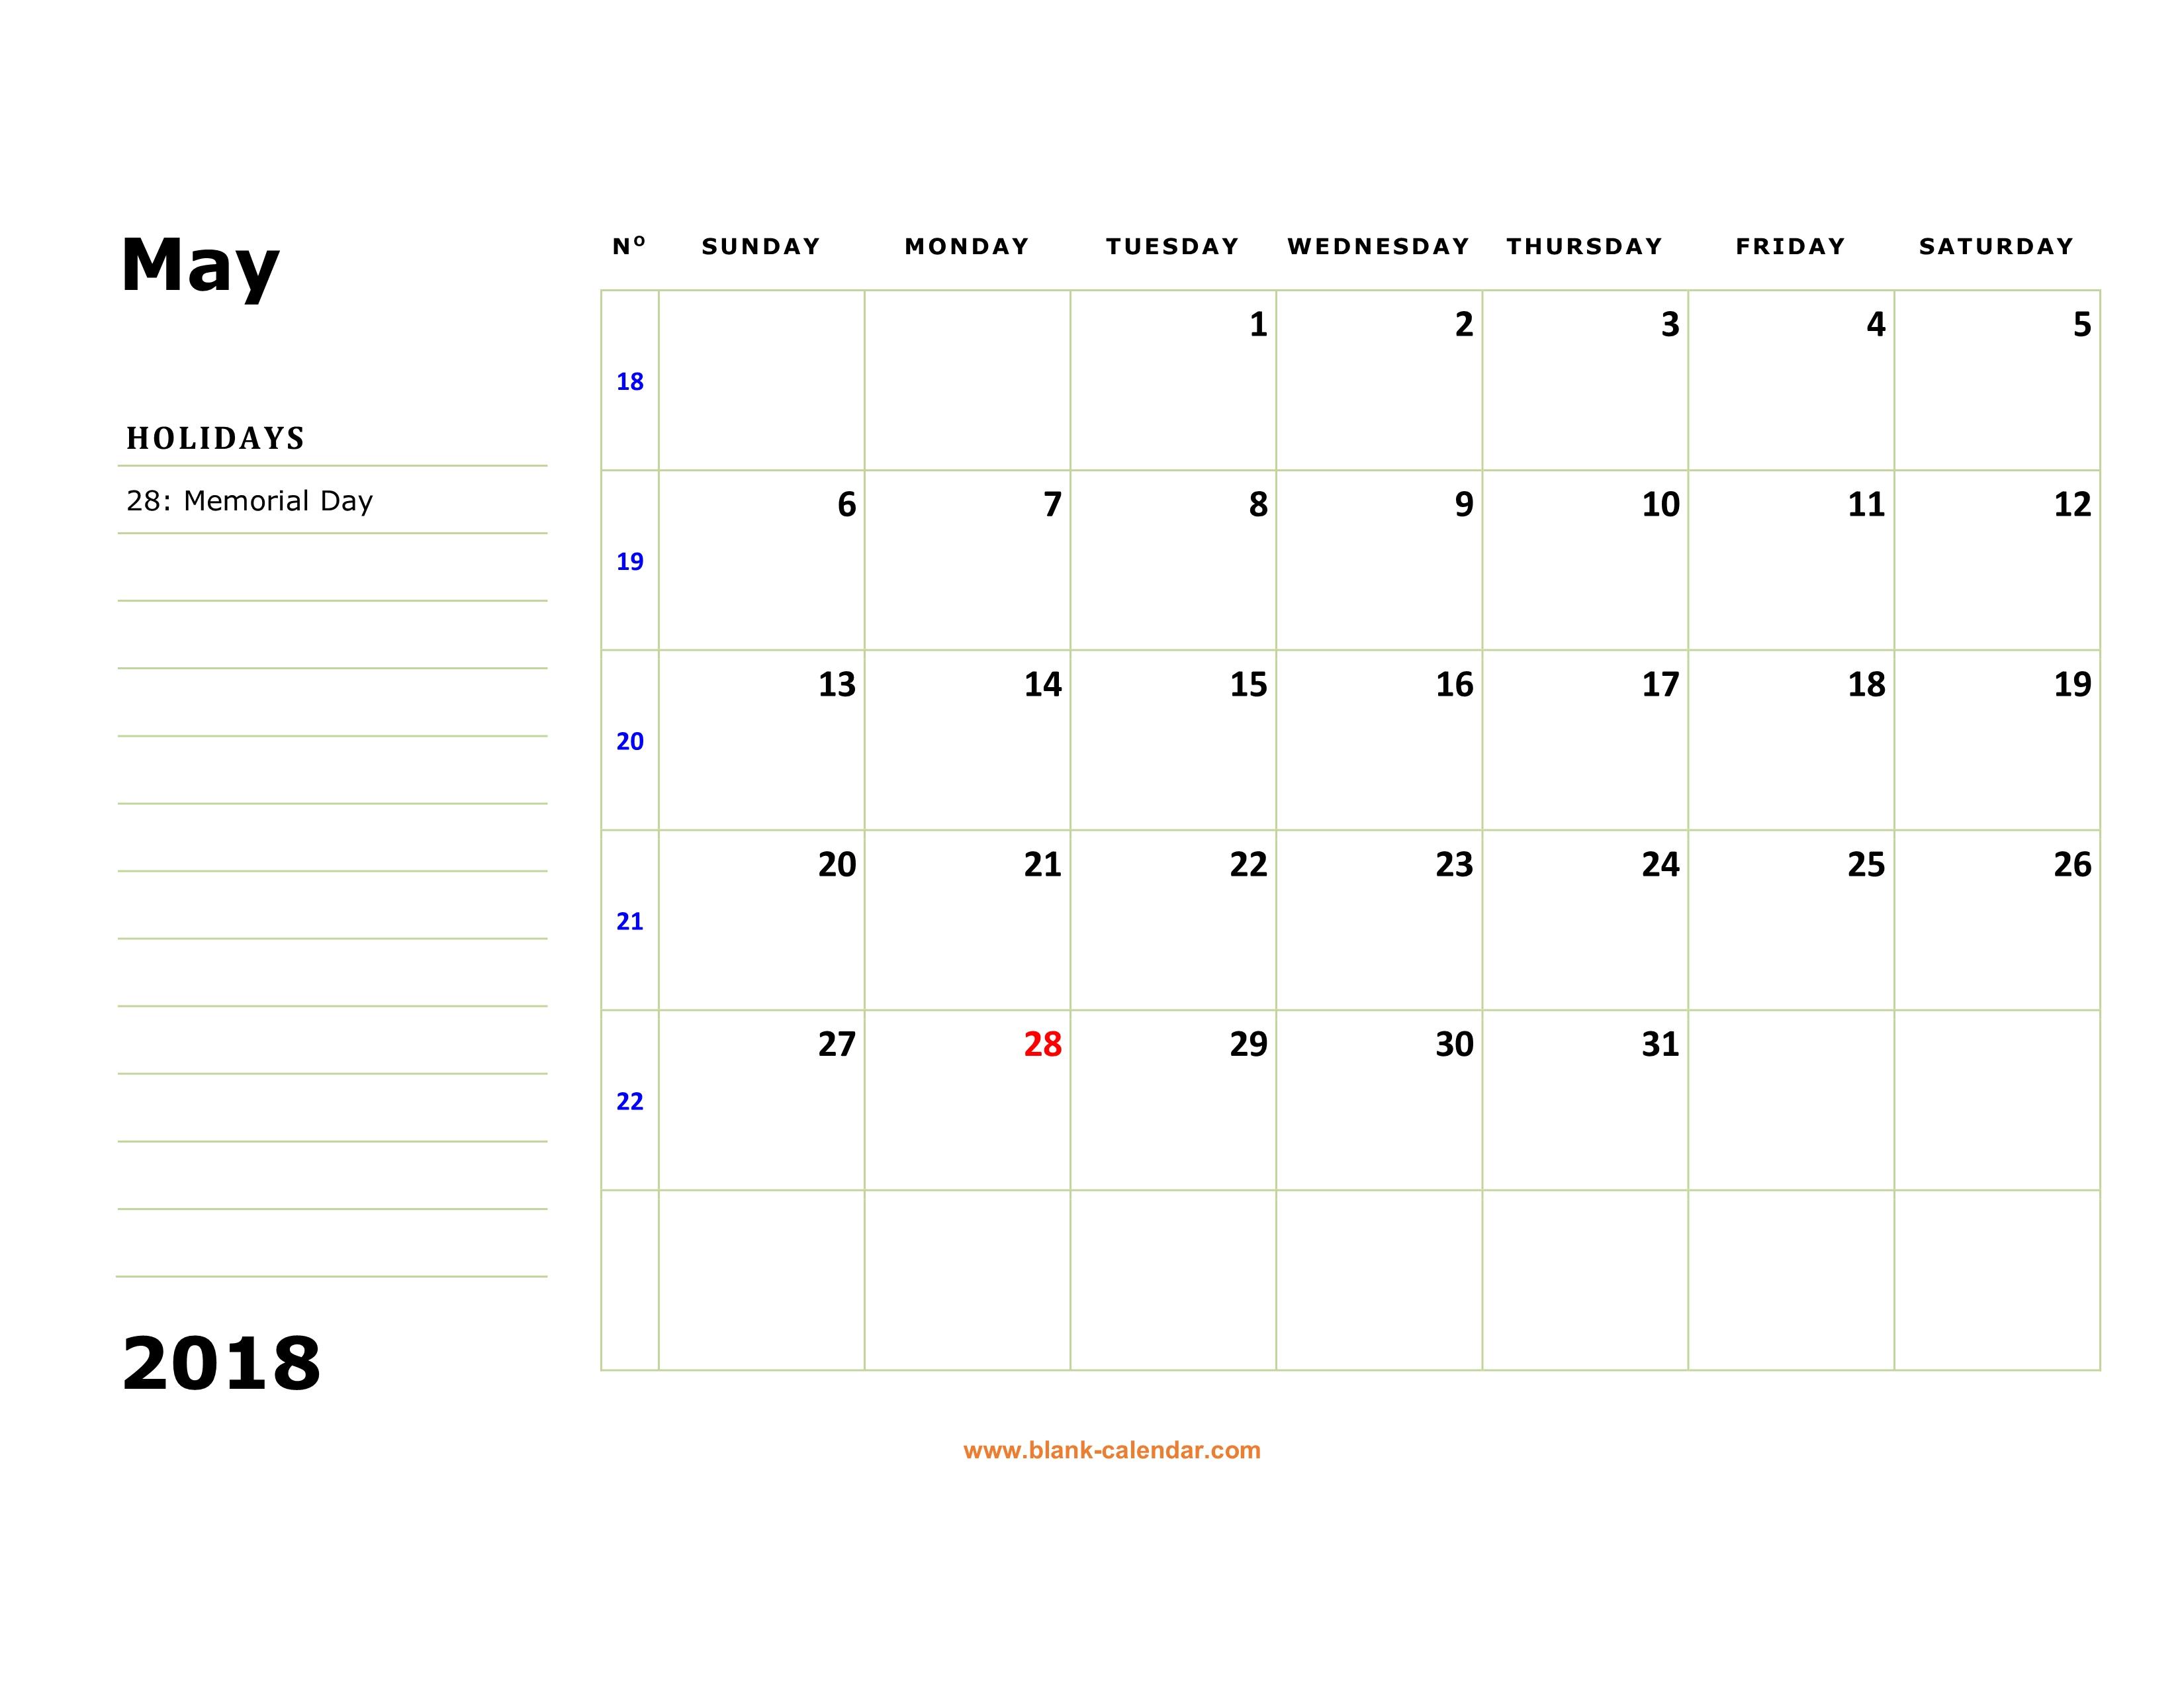 printable calendar may 2018 with holidays